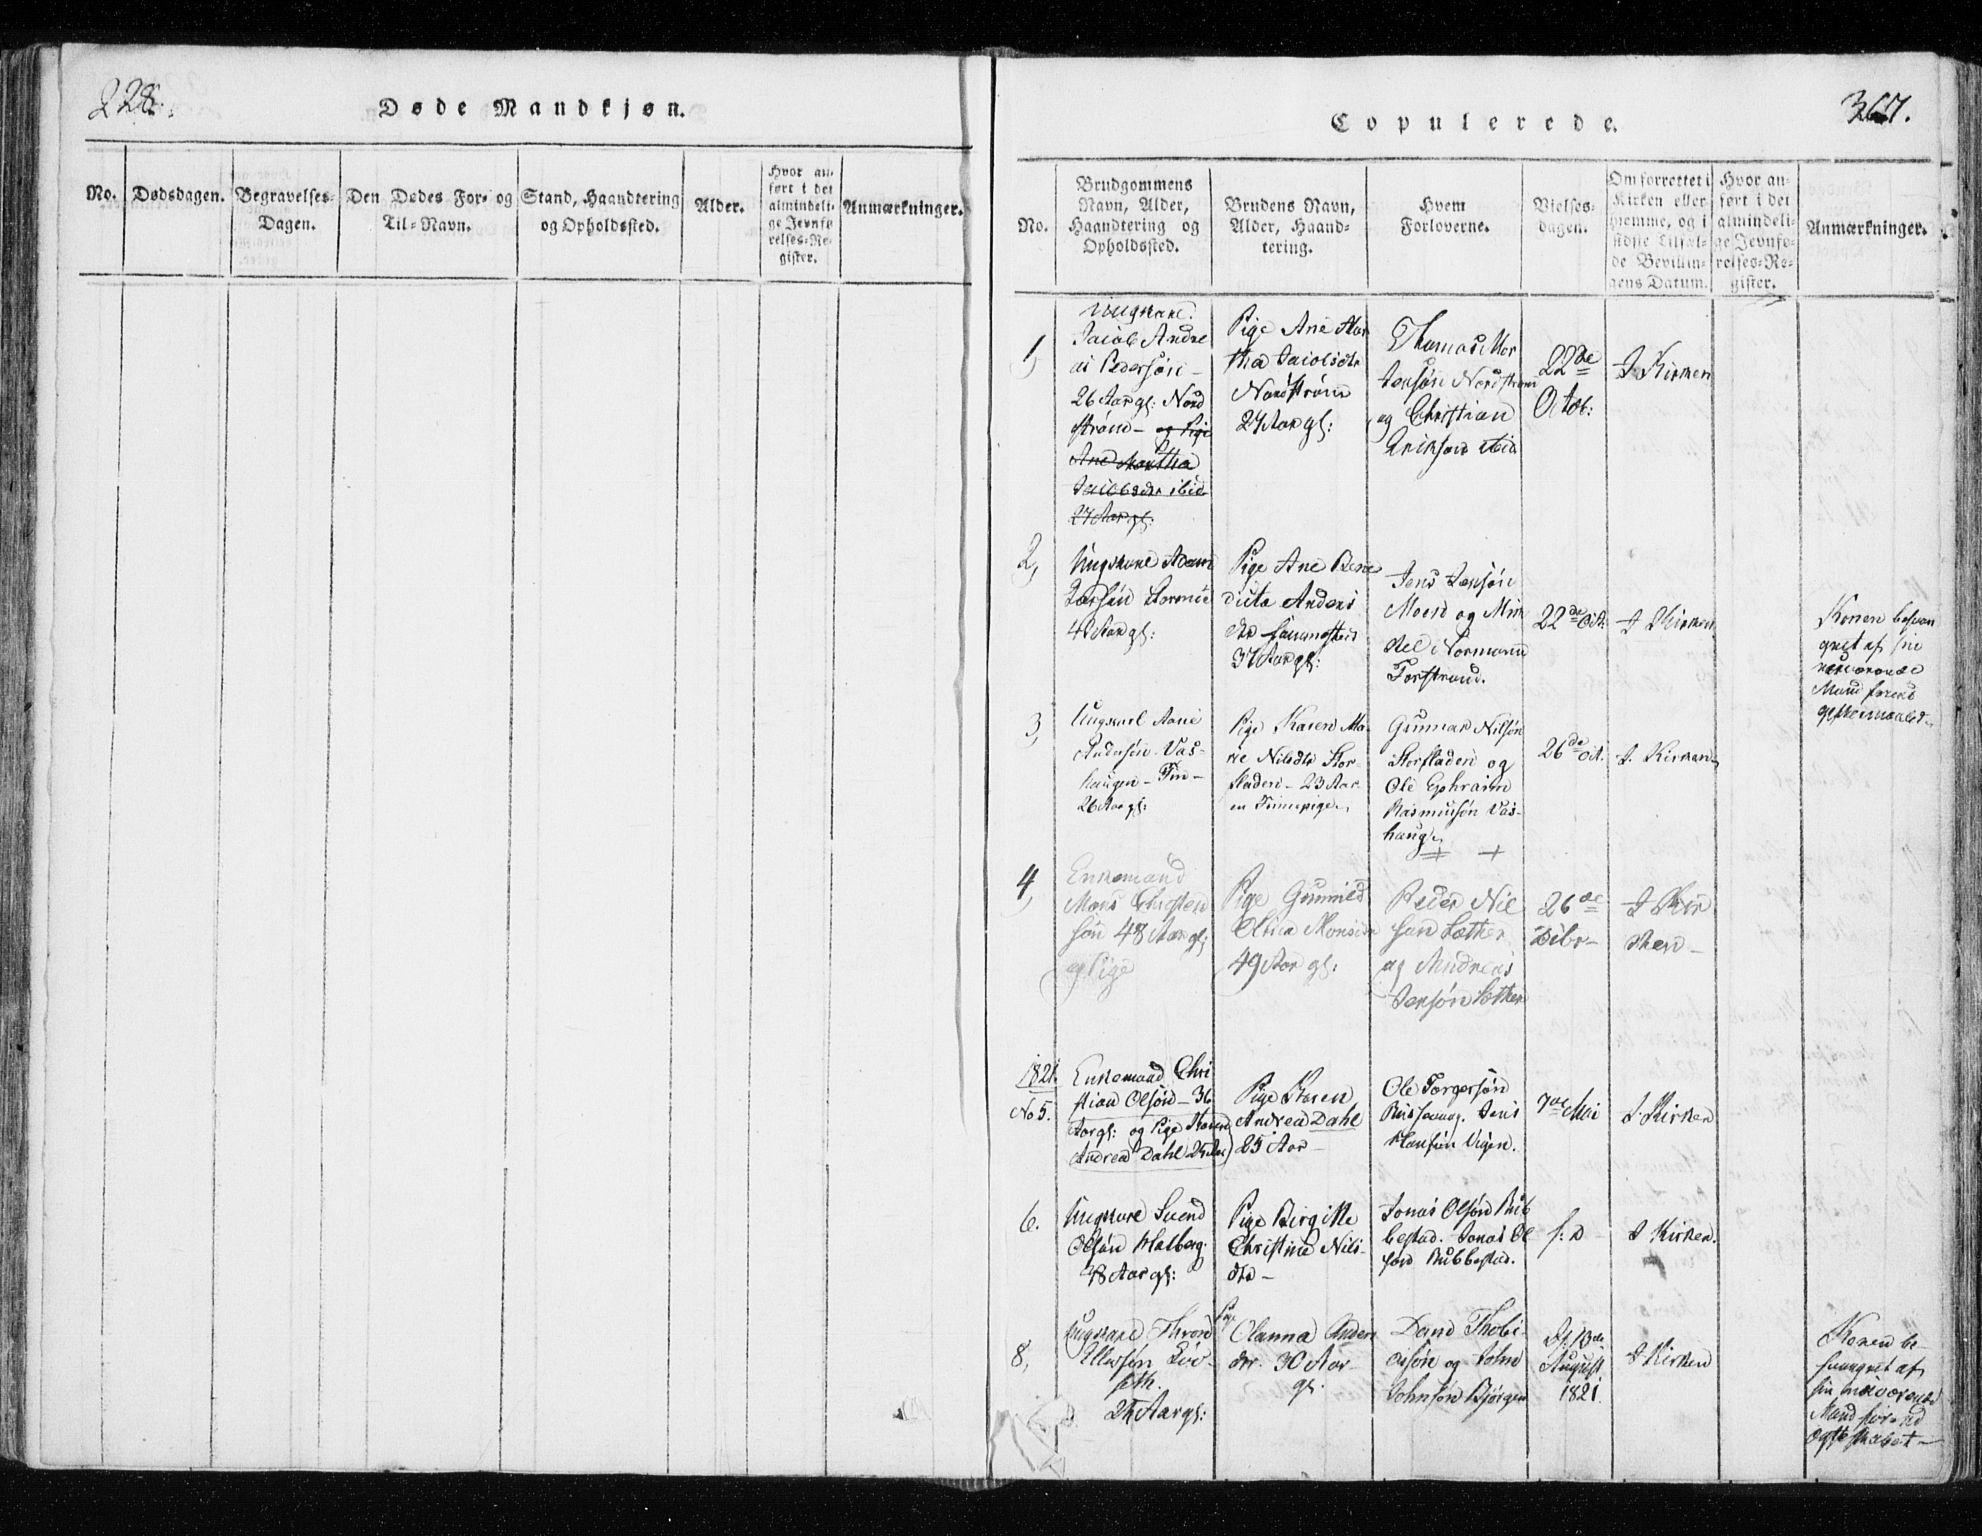 SATØ, Tranøy sokneprestkontor, I/Ia/Iaa/L0004kirke: Ministerialbok nr. 4, 1820-1829, s. 366-367